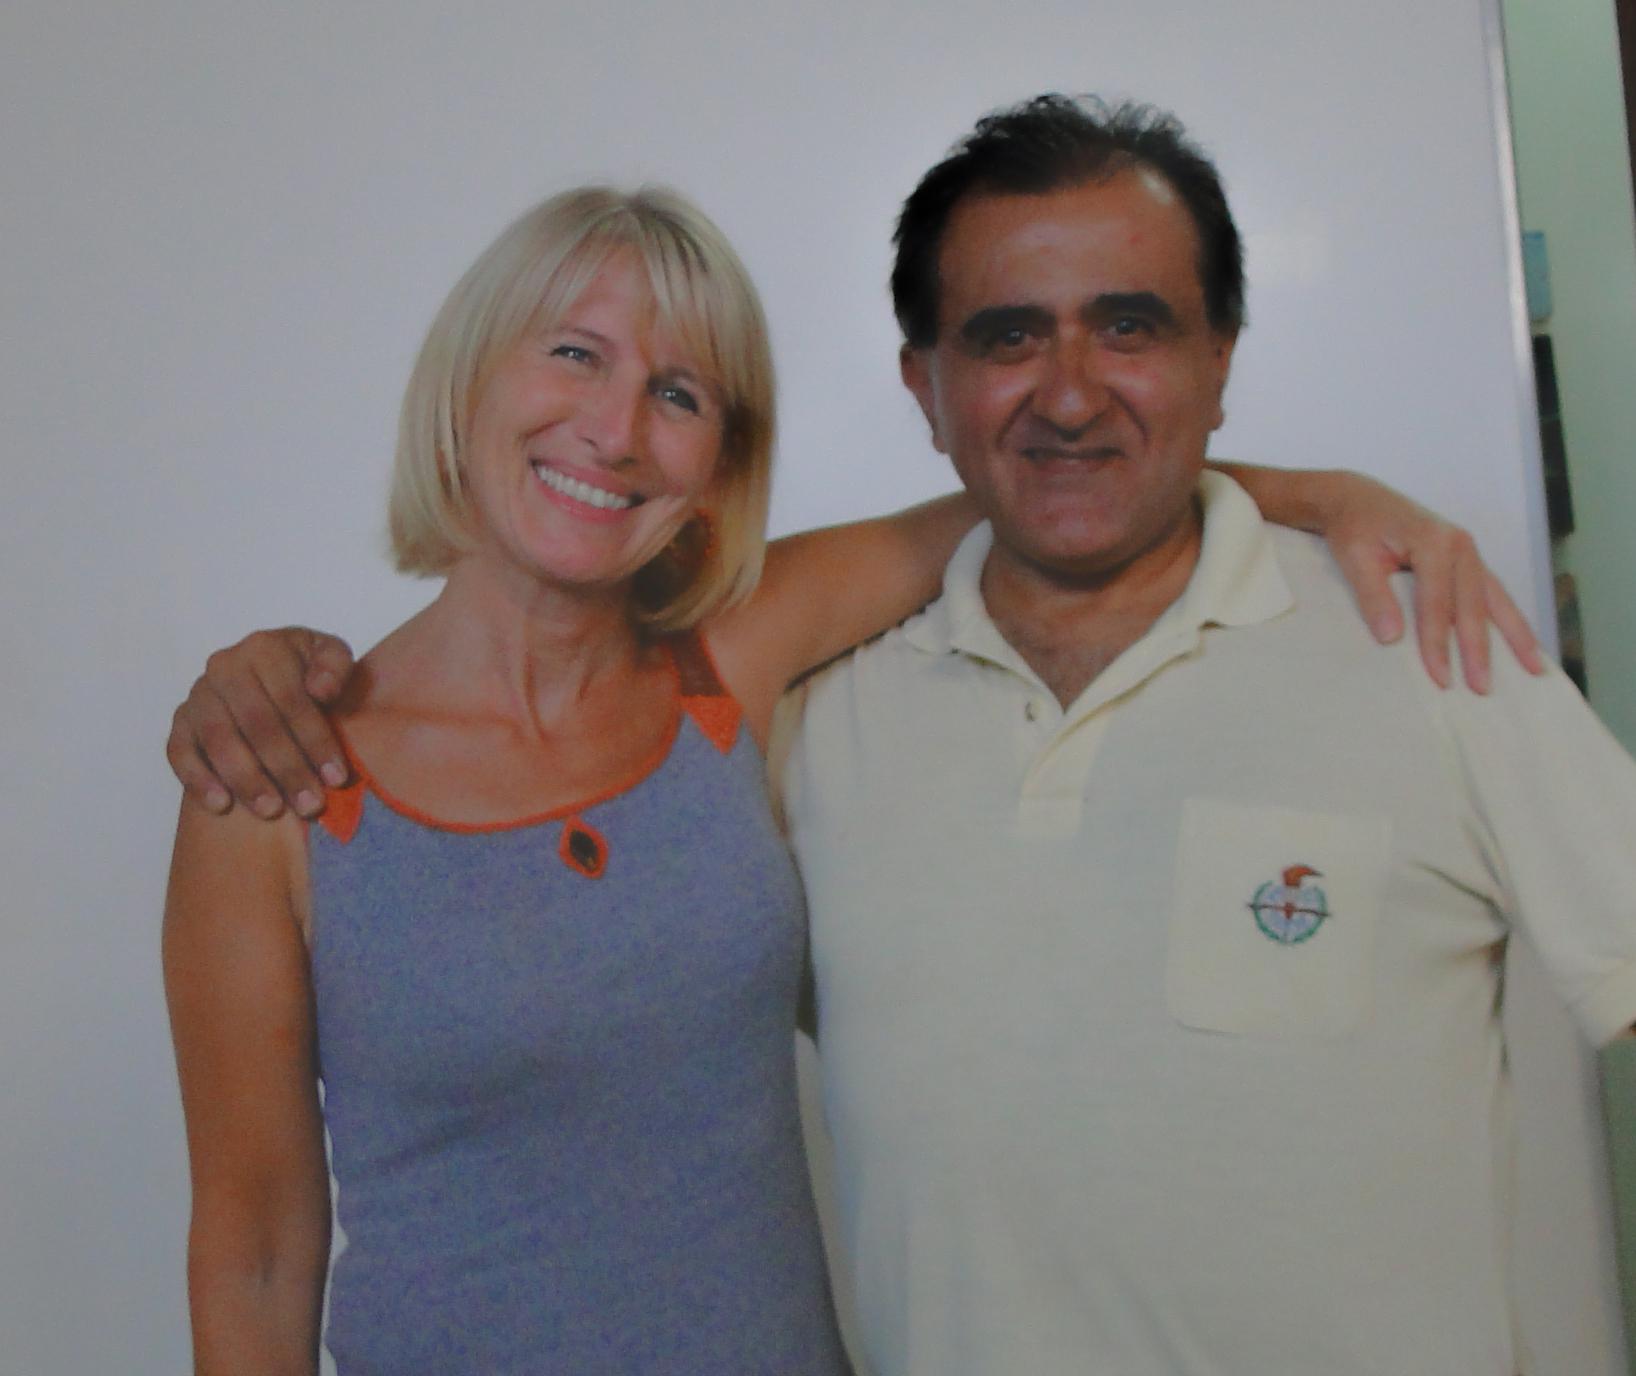 SIMONE DE BEAUVOIR | ANDREA PALLERO| DONACION A LA CASONA